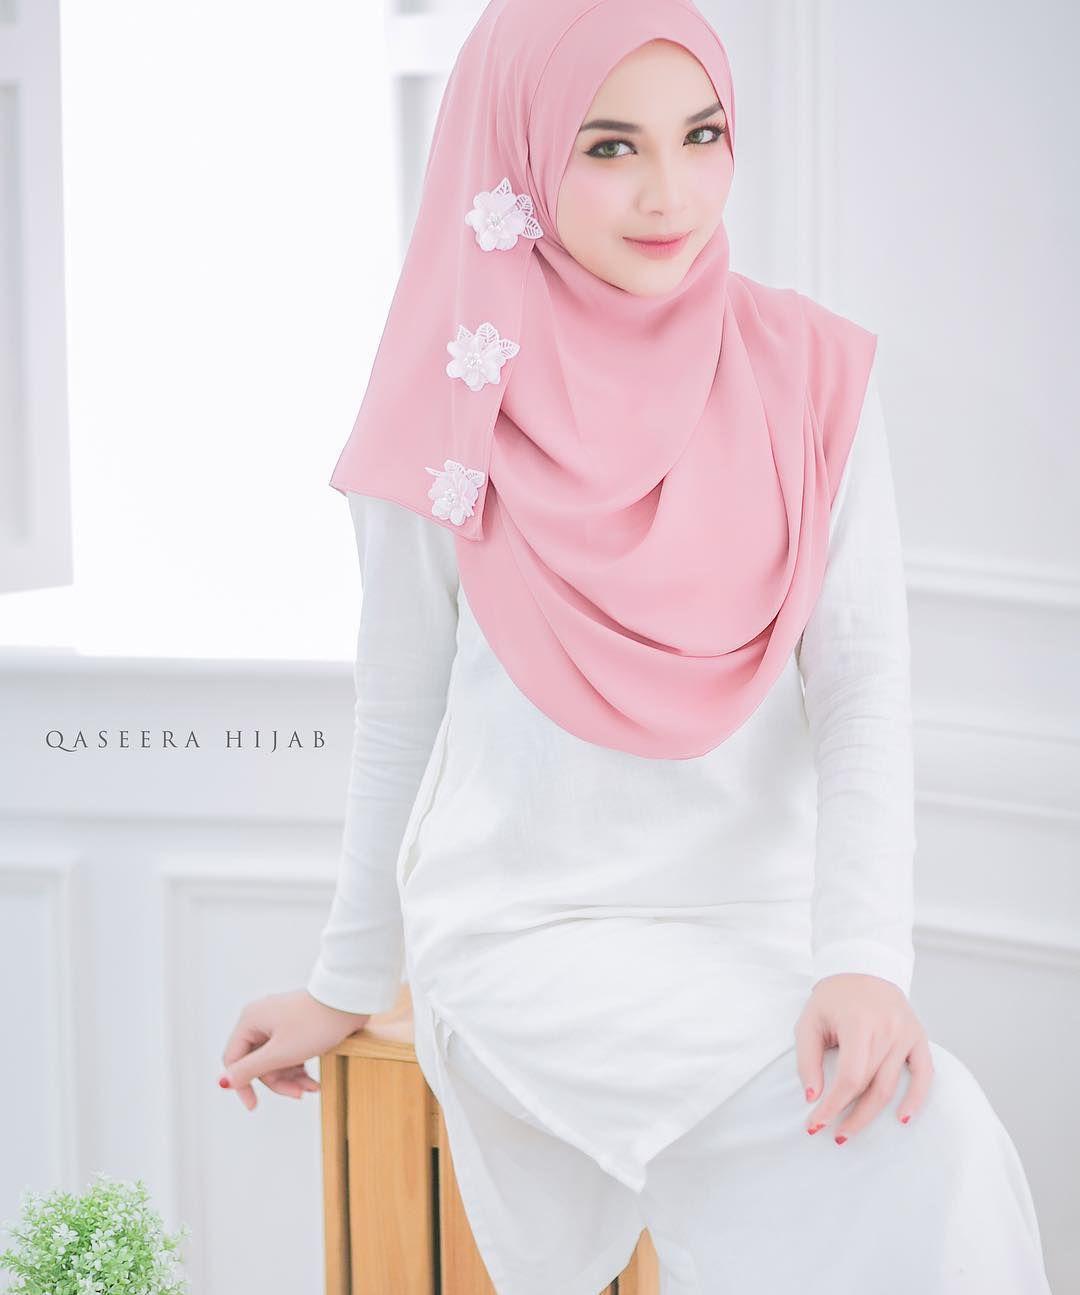 Photoshoot For Qaseerahijab Model By Shazlinaabdullah Photographer Zaskia Mecca Fadele Hijab Pink Muslimah Fashion Photography Butik Malaysia Hijabstyle Muslimahdress Hijabfashion Makeup Mua Womensfashion Ootd